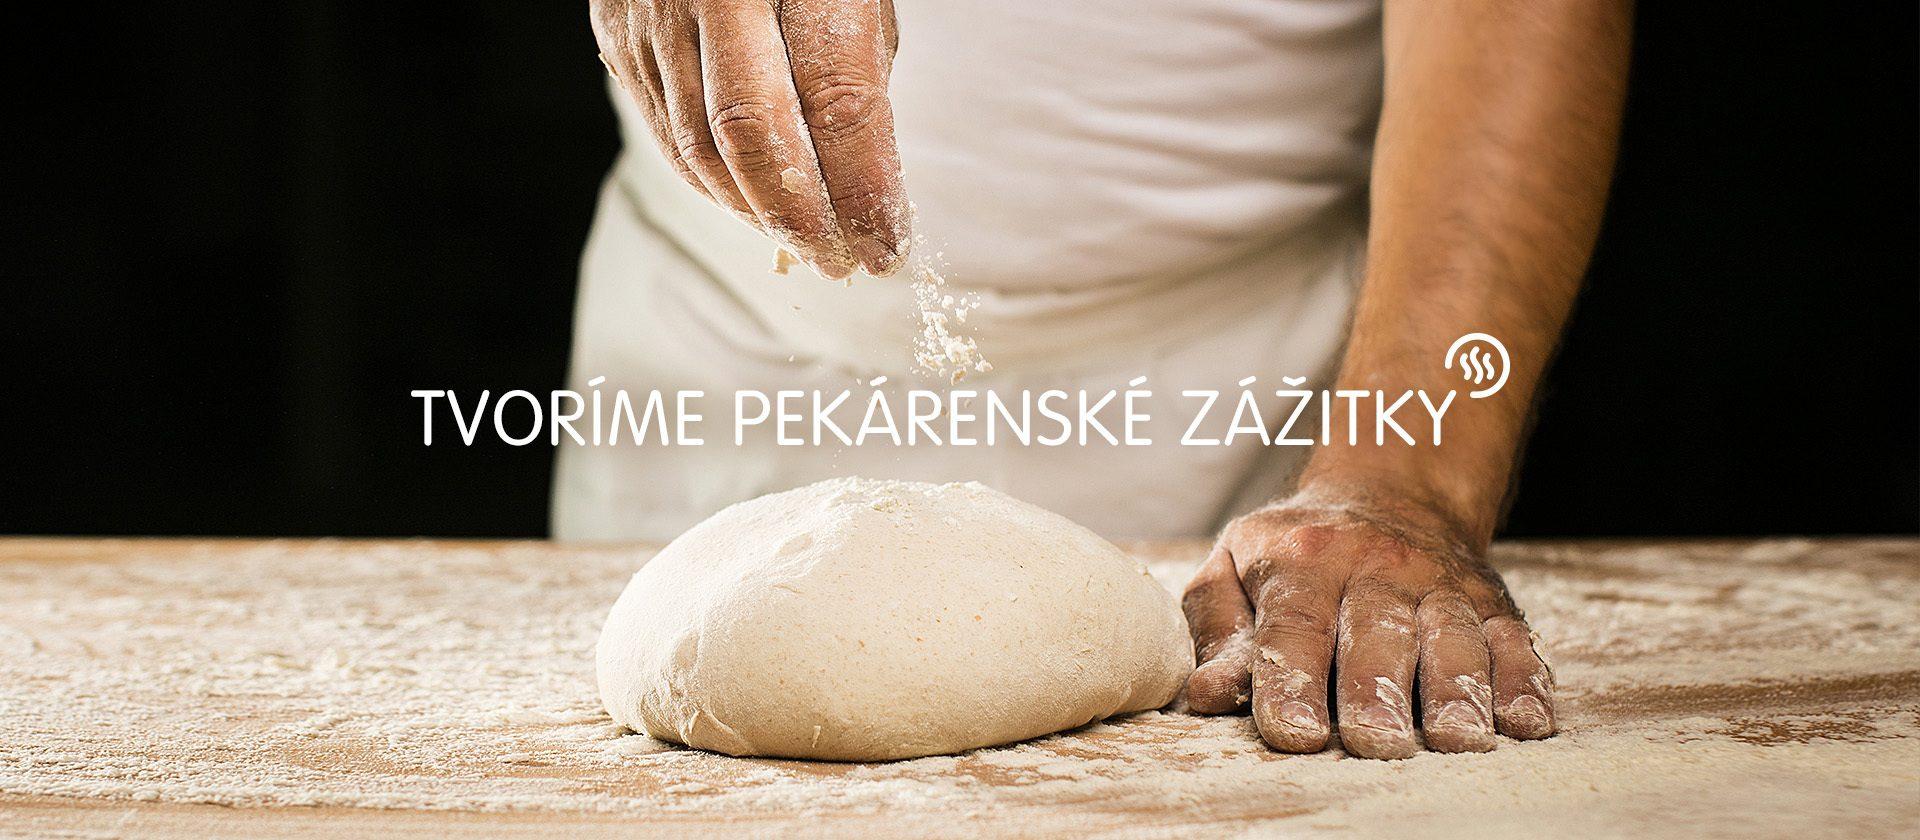 Kvasok chlieb web 6 B